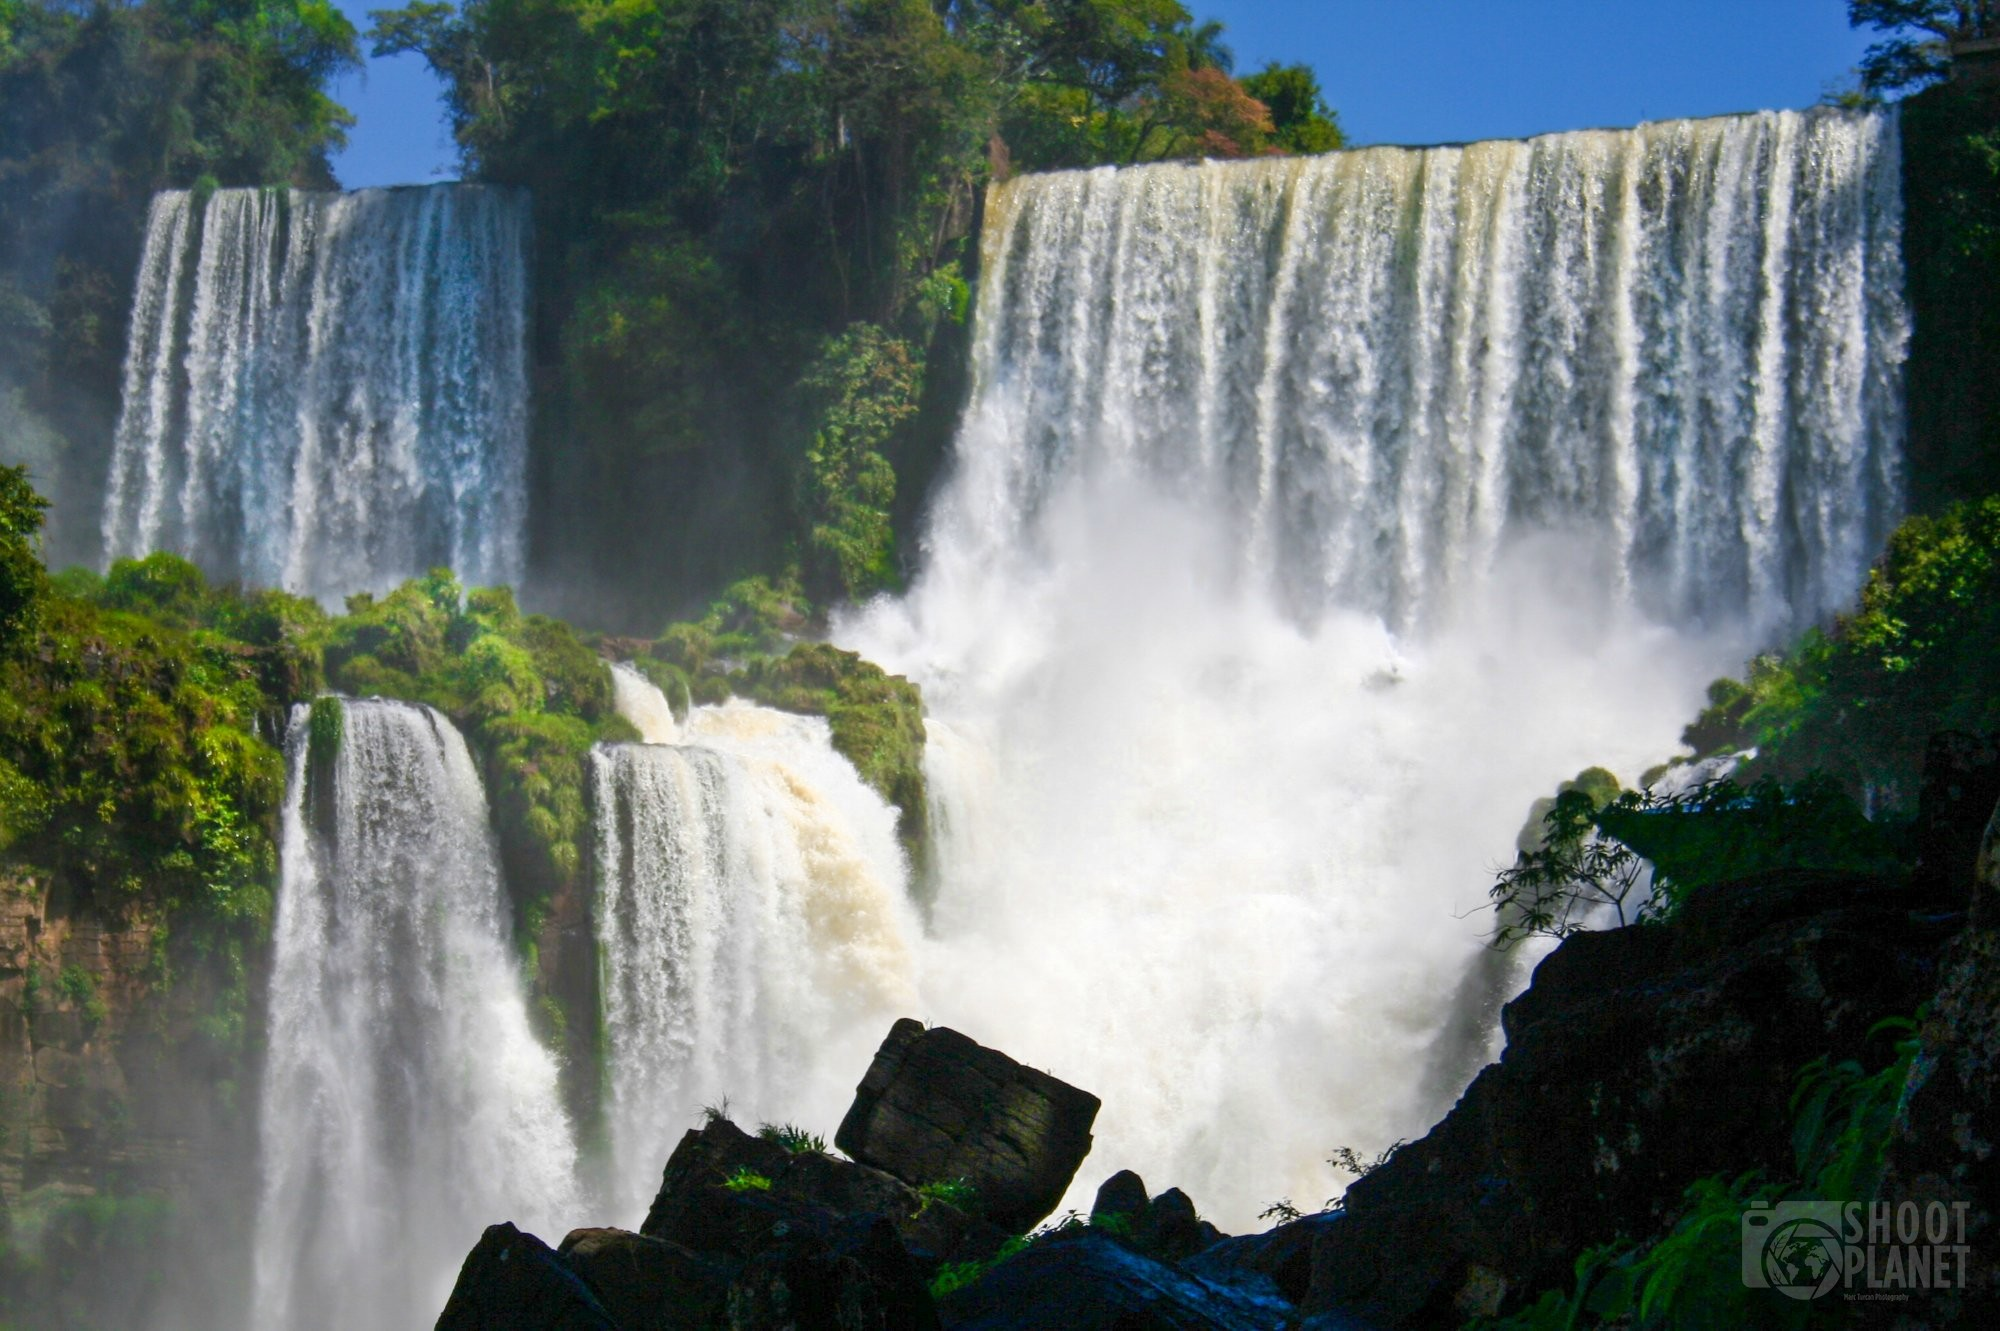 Iguazu falls cataracts and wet rocks, Brazil